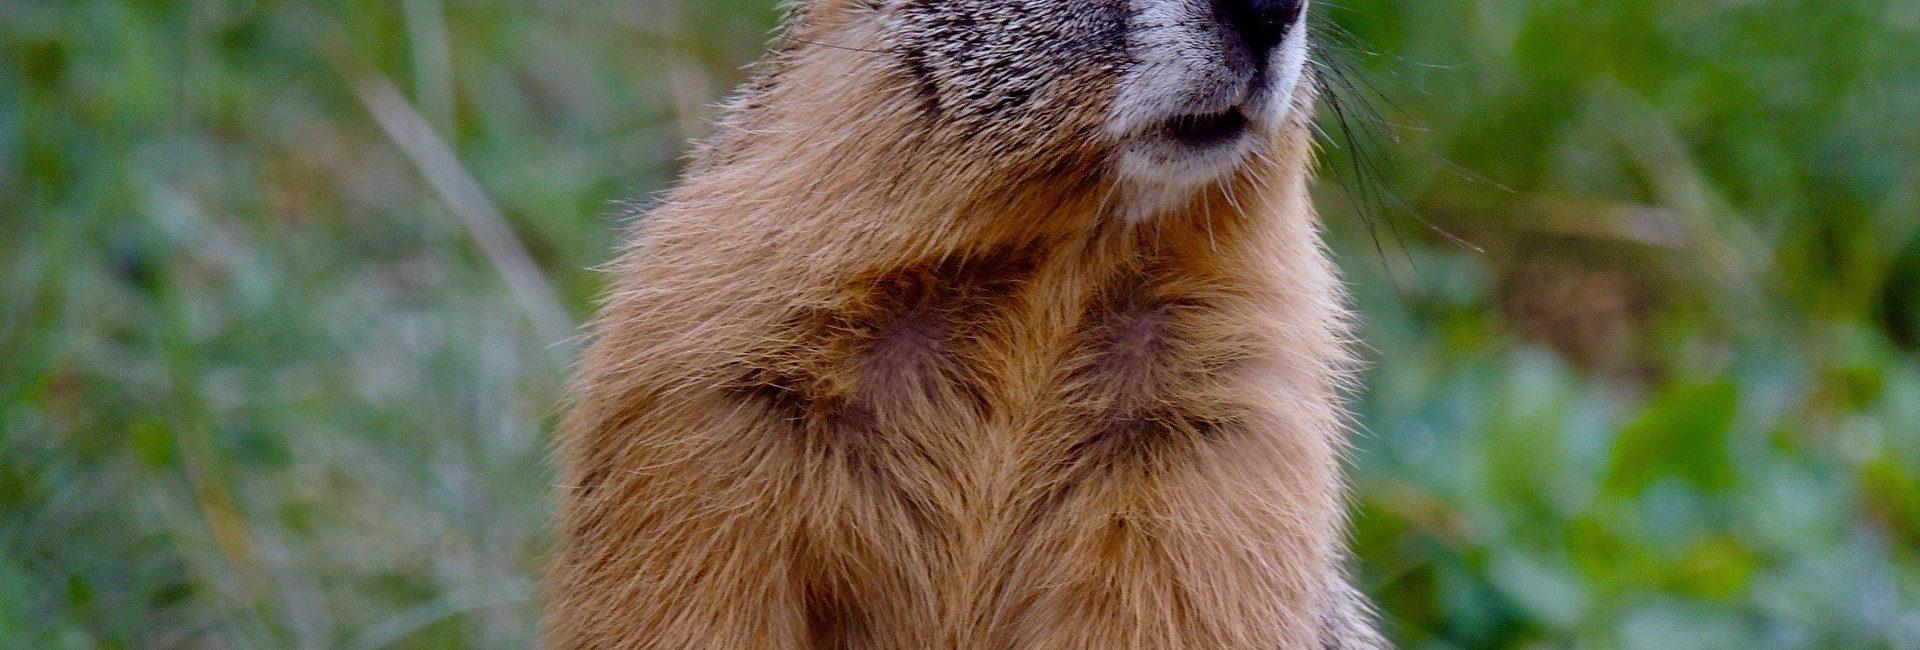 marmot-5249335_1920